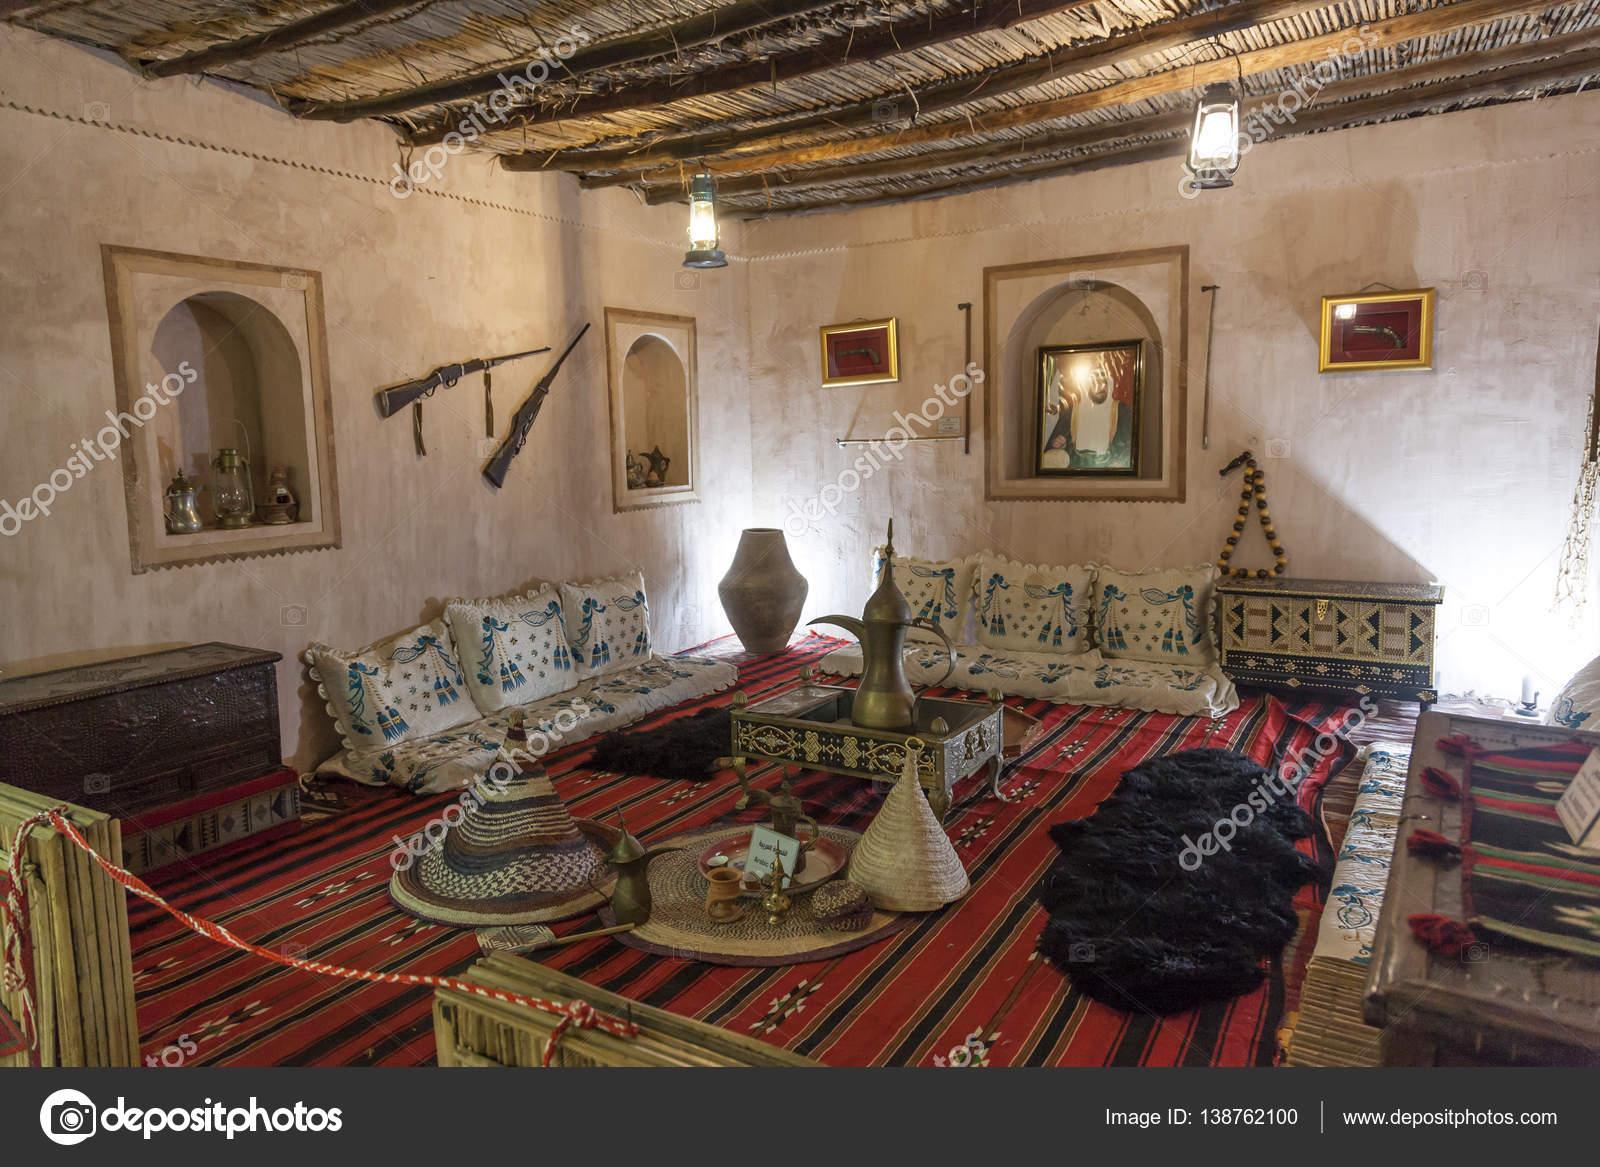 https://st3.depositphotos.com/1134101/13876/i/1600/depositphotos_138762100-stock-photo-interior-of-an-old-bedouin.jpg